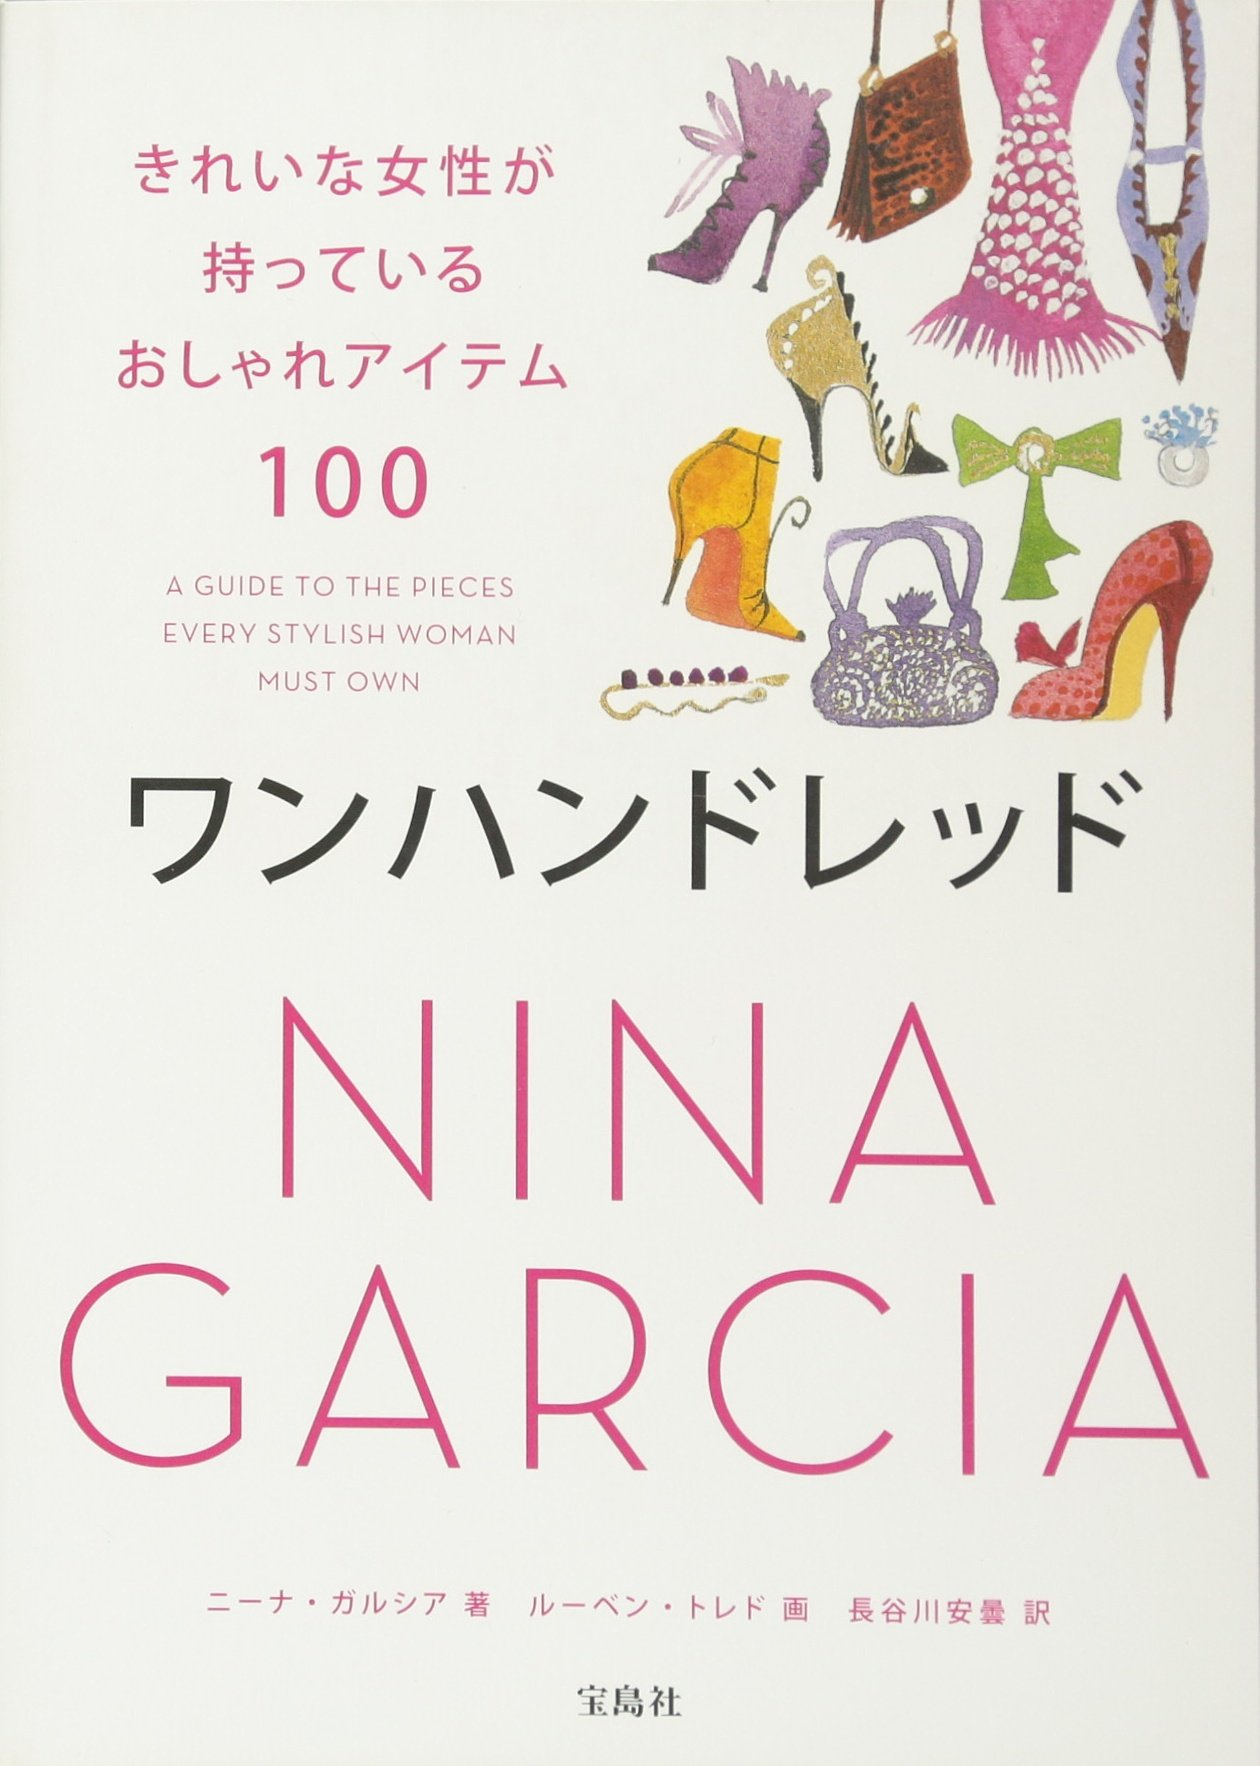 Fashion item 100 women beautiful one Hundred has PDF